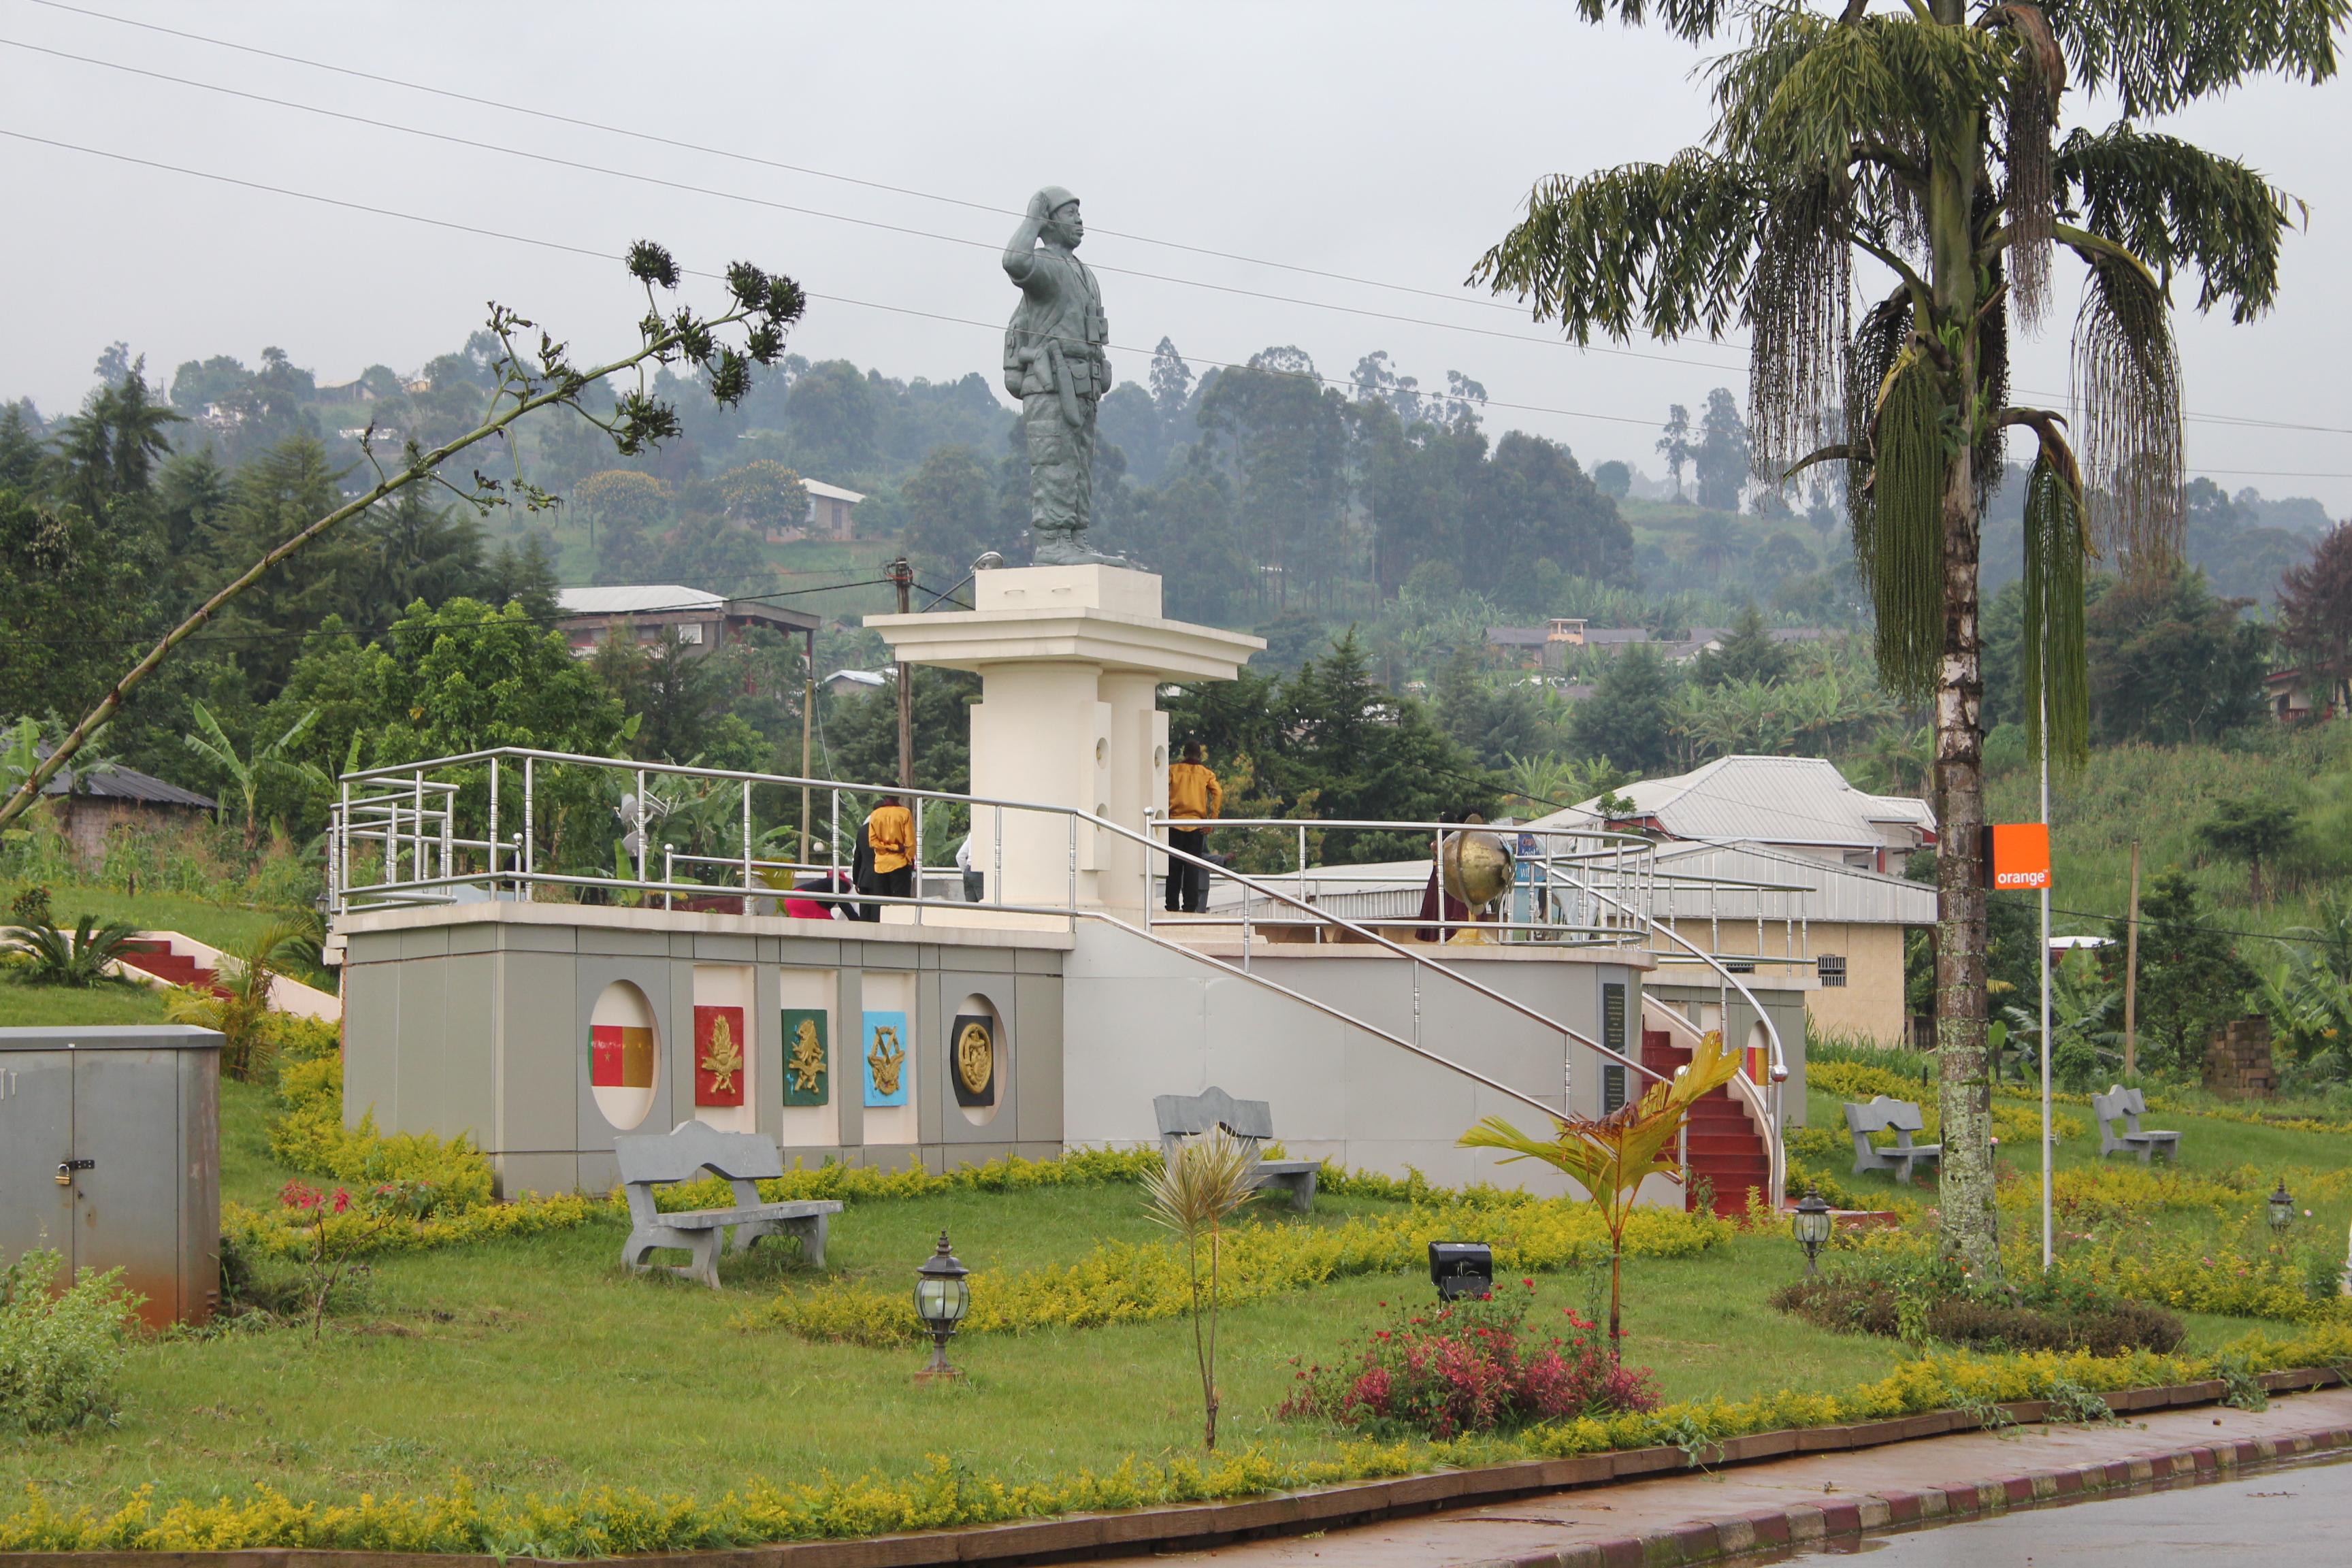 Free Personals in Bamenda